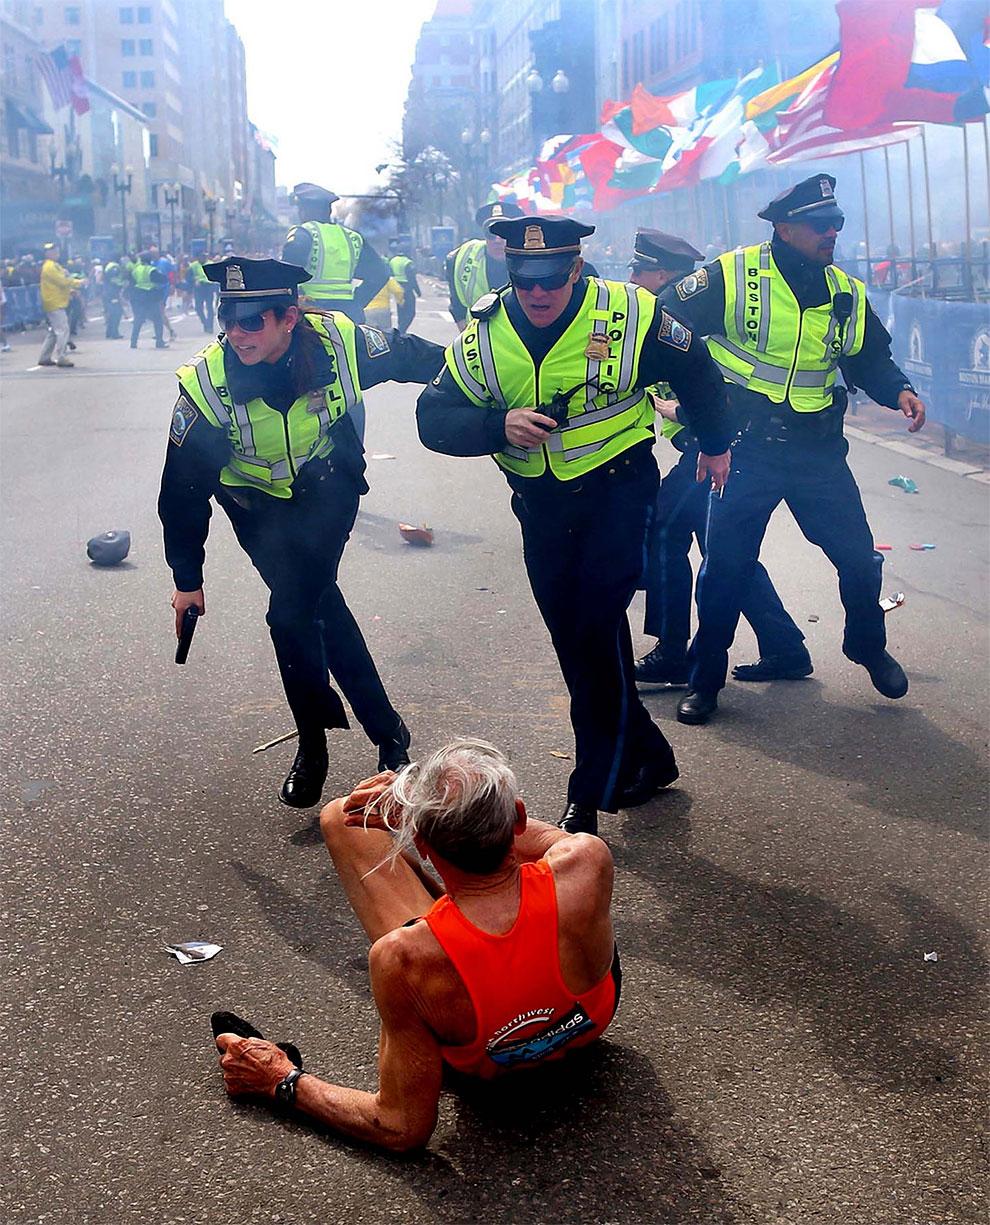 178 National Press Photographers Association's Best of Photojournalism 2014 Awards